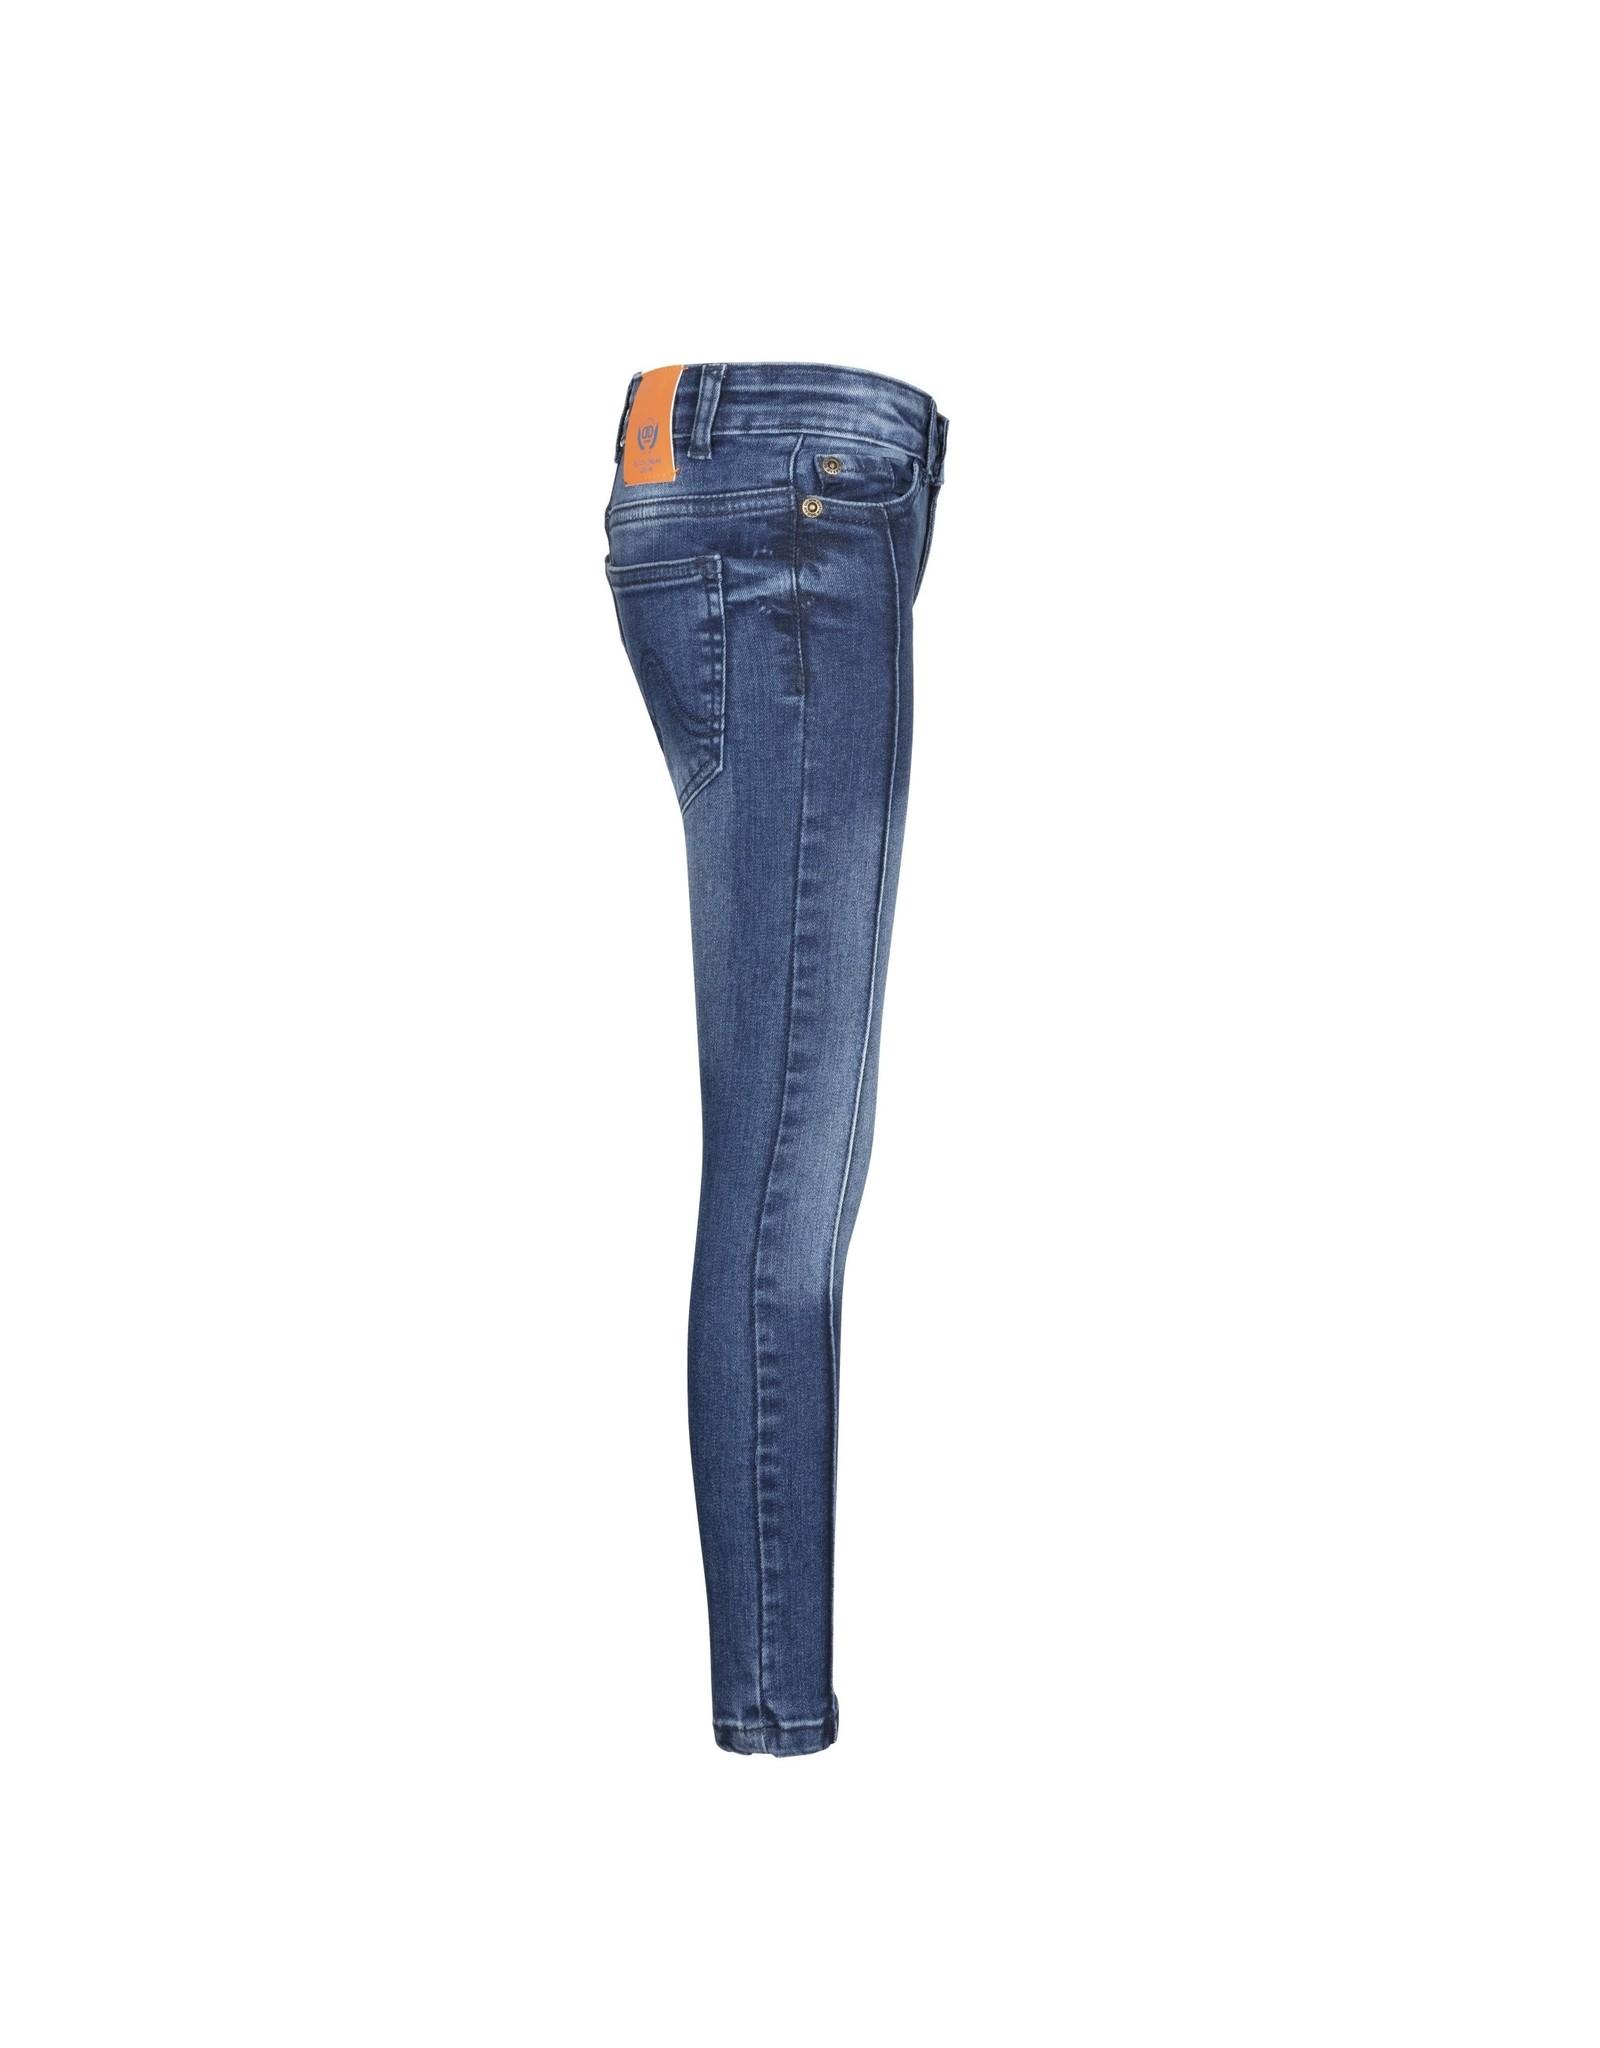 DDD DDD meisjes skinny jeans Taka